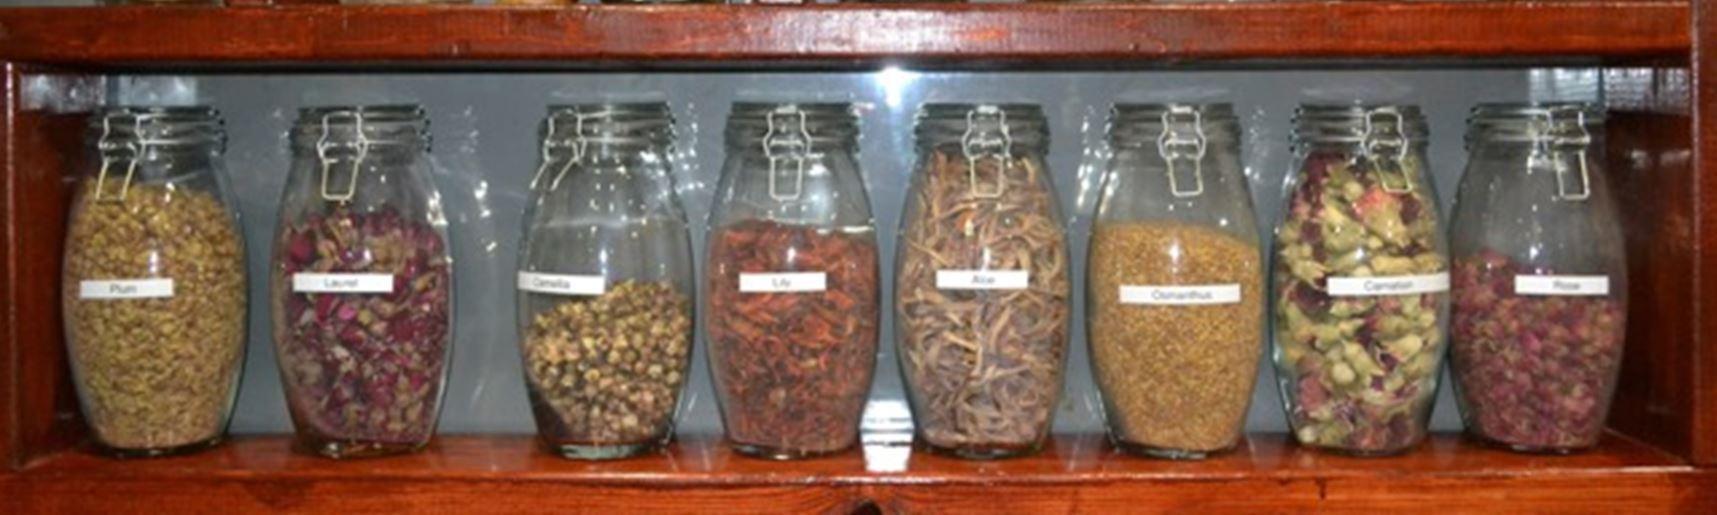 Our tea selection